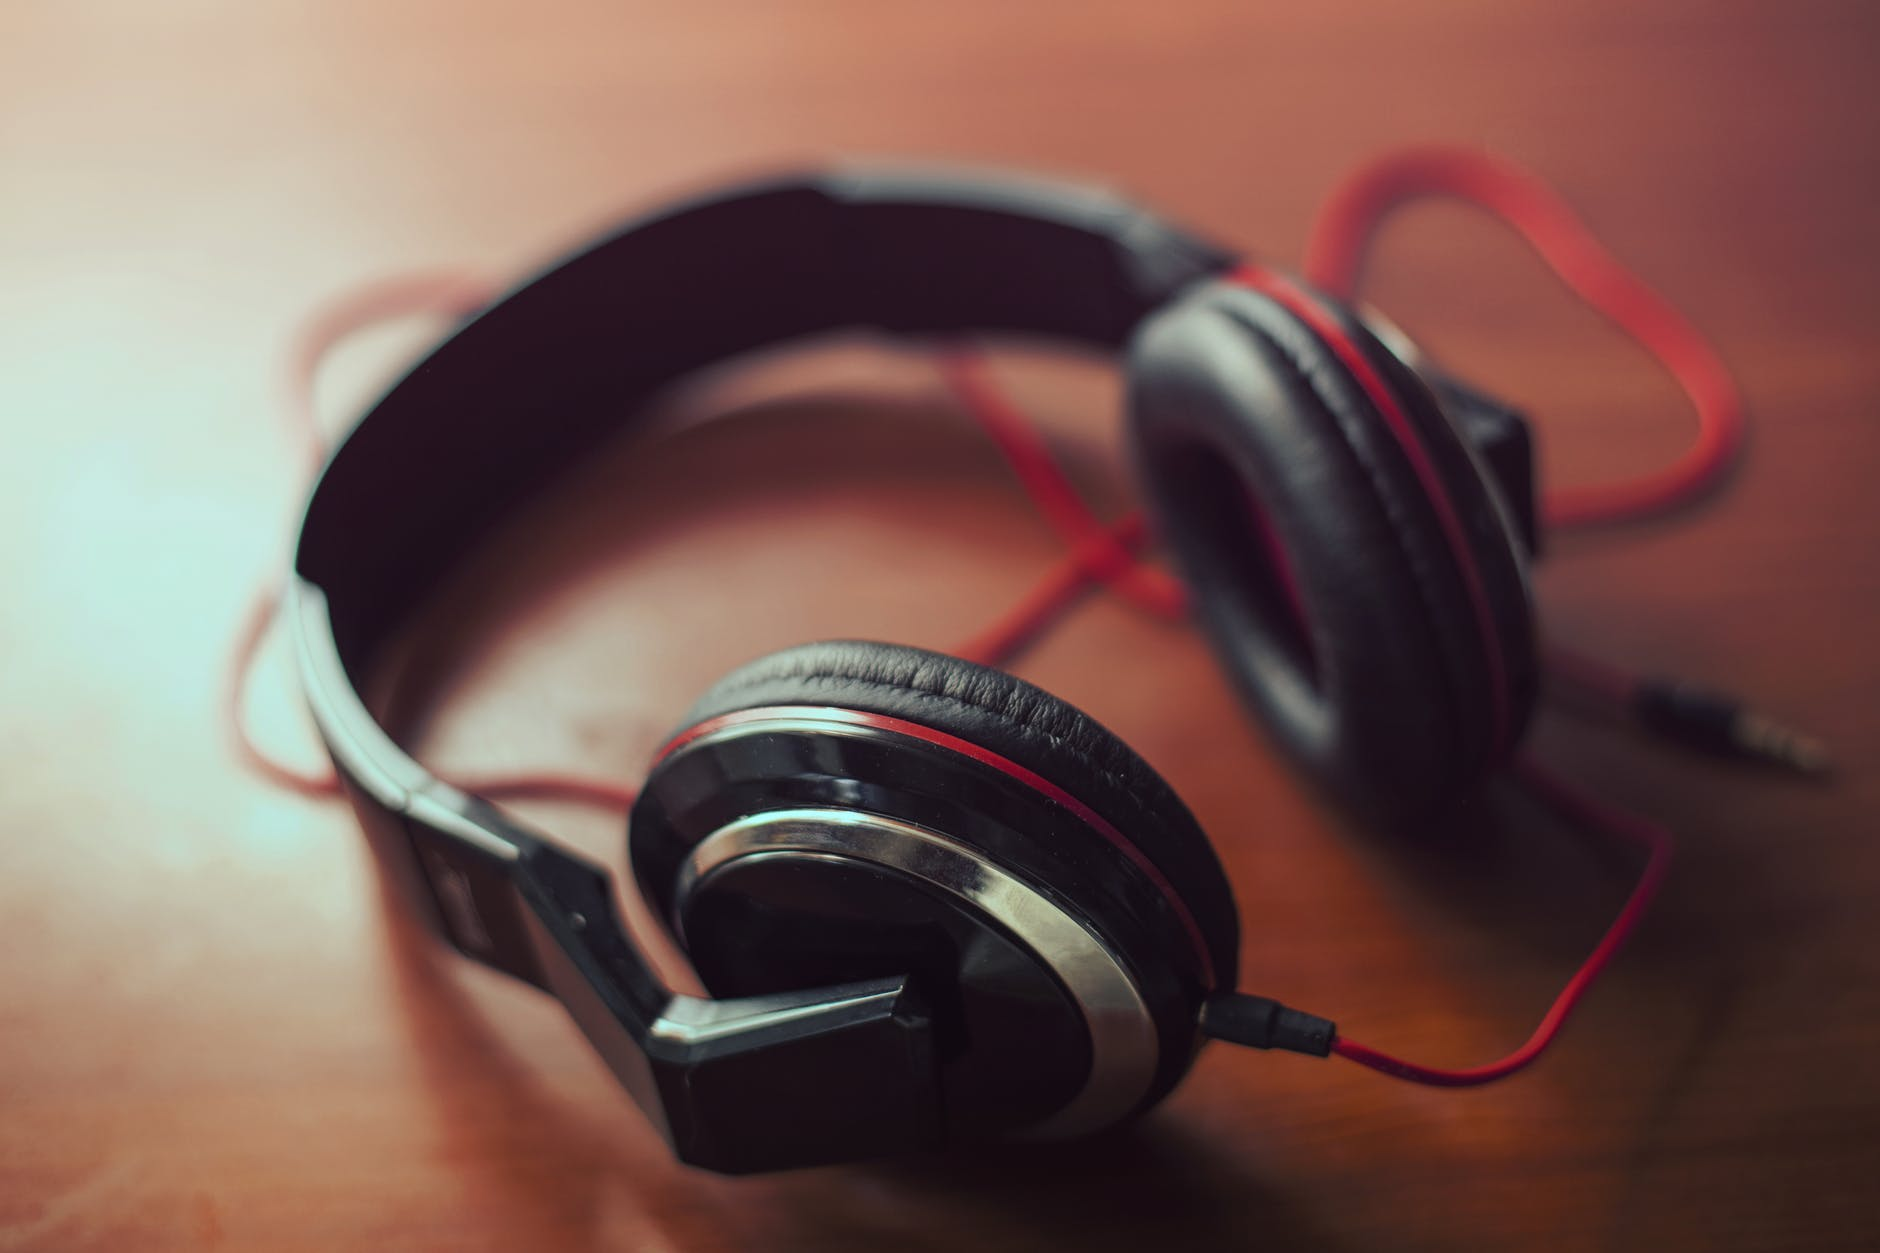 technology-music-sound-things.jpg